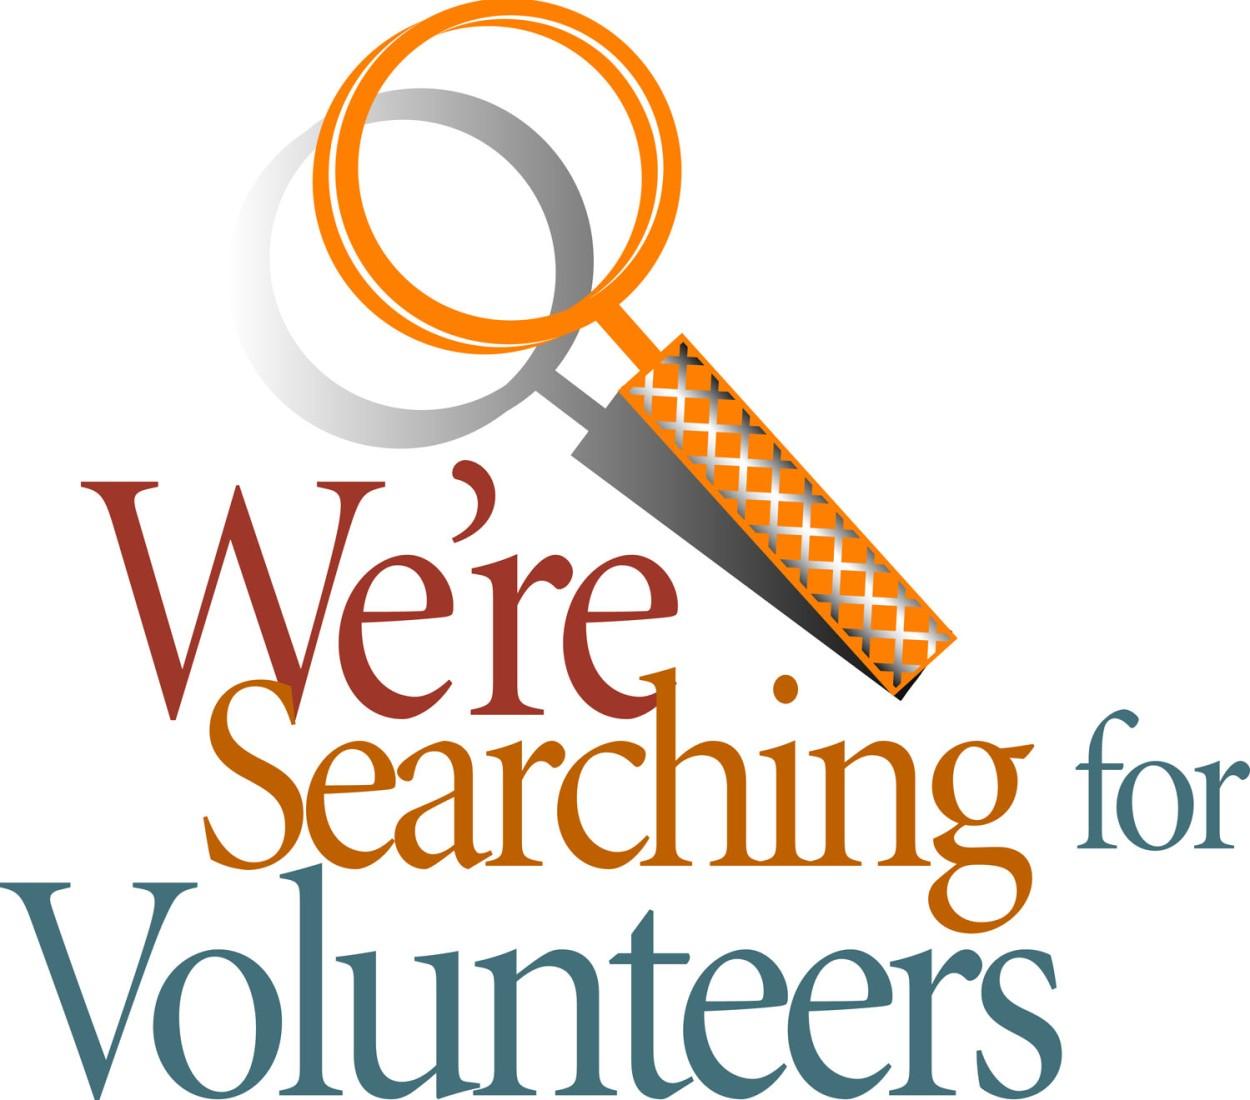 Unity Through Solutions Needs Volunteers